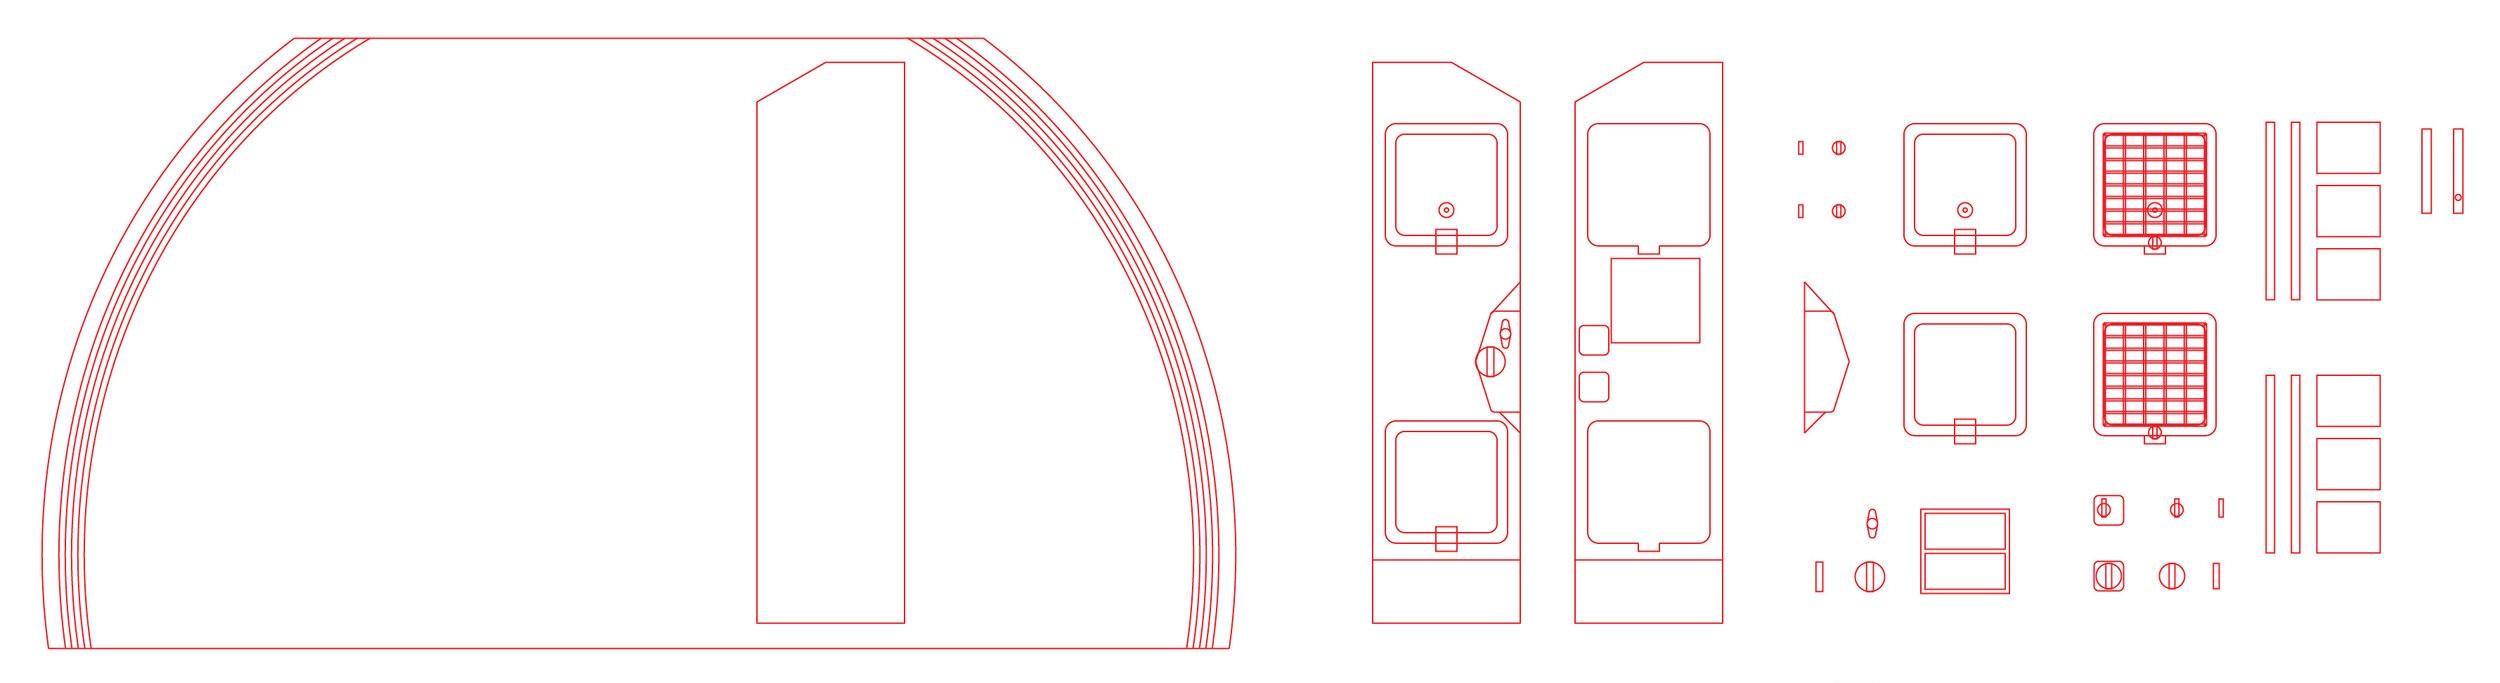 Cabin - cockpit - drawings 8.jpg